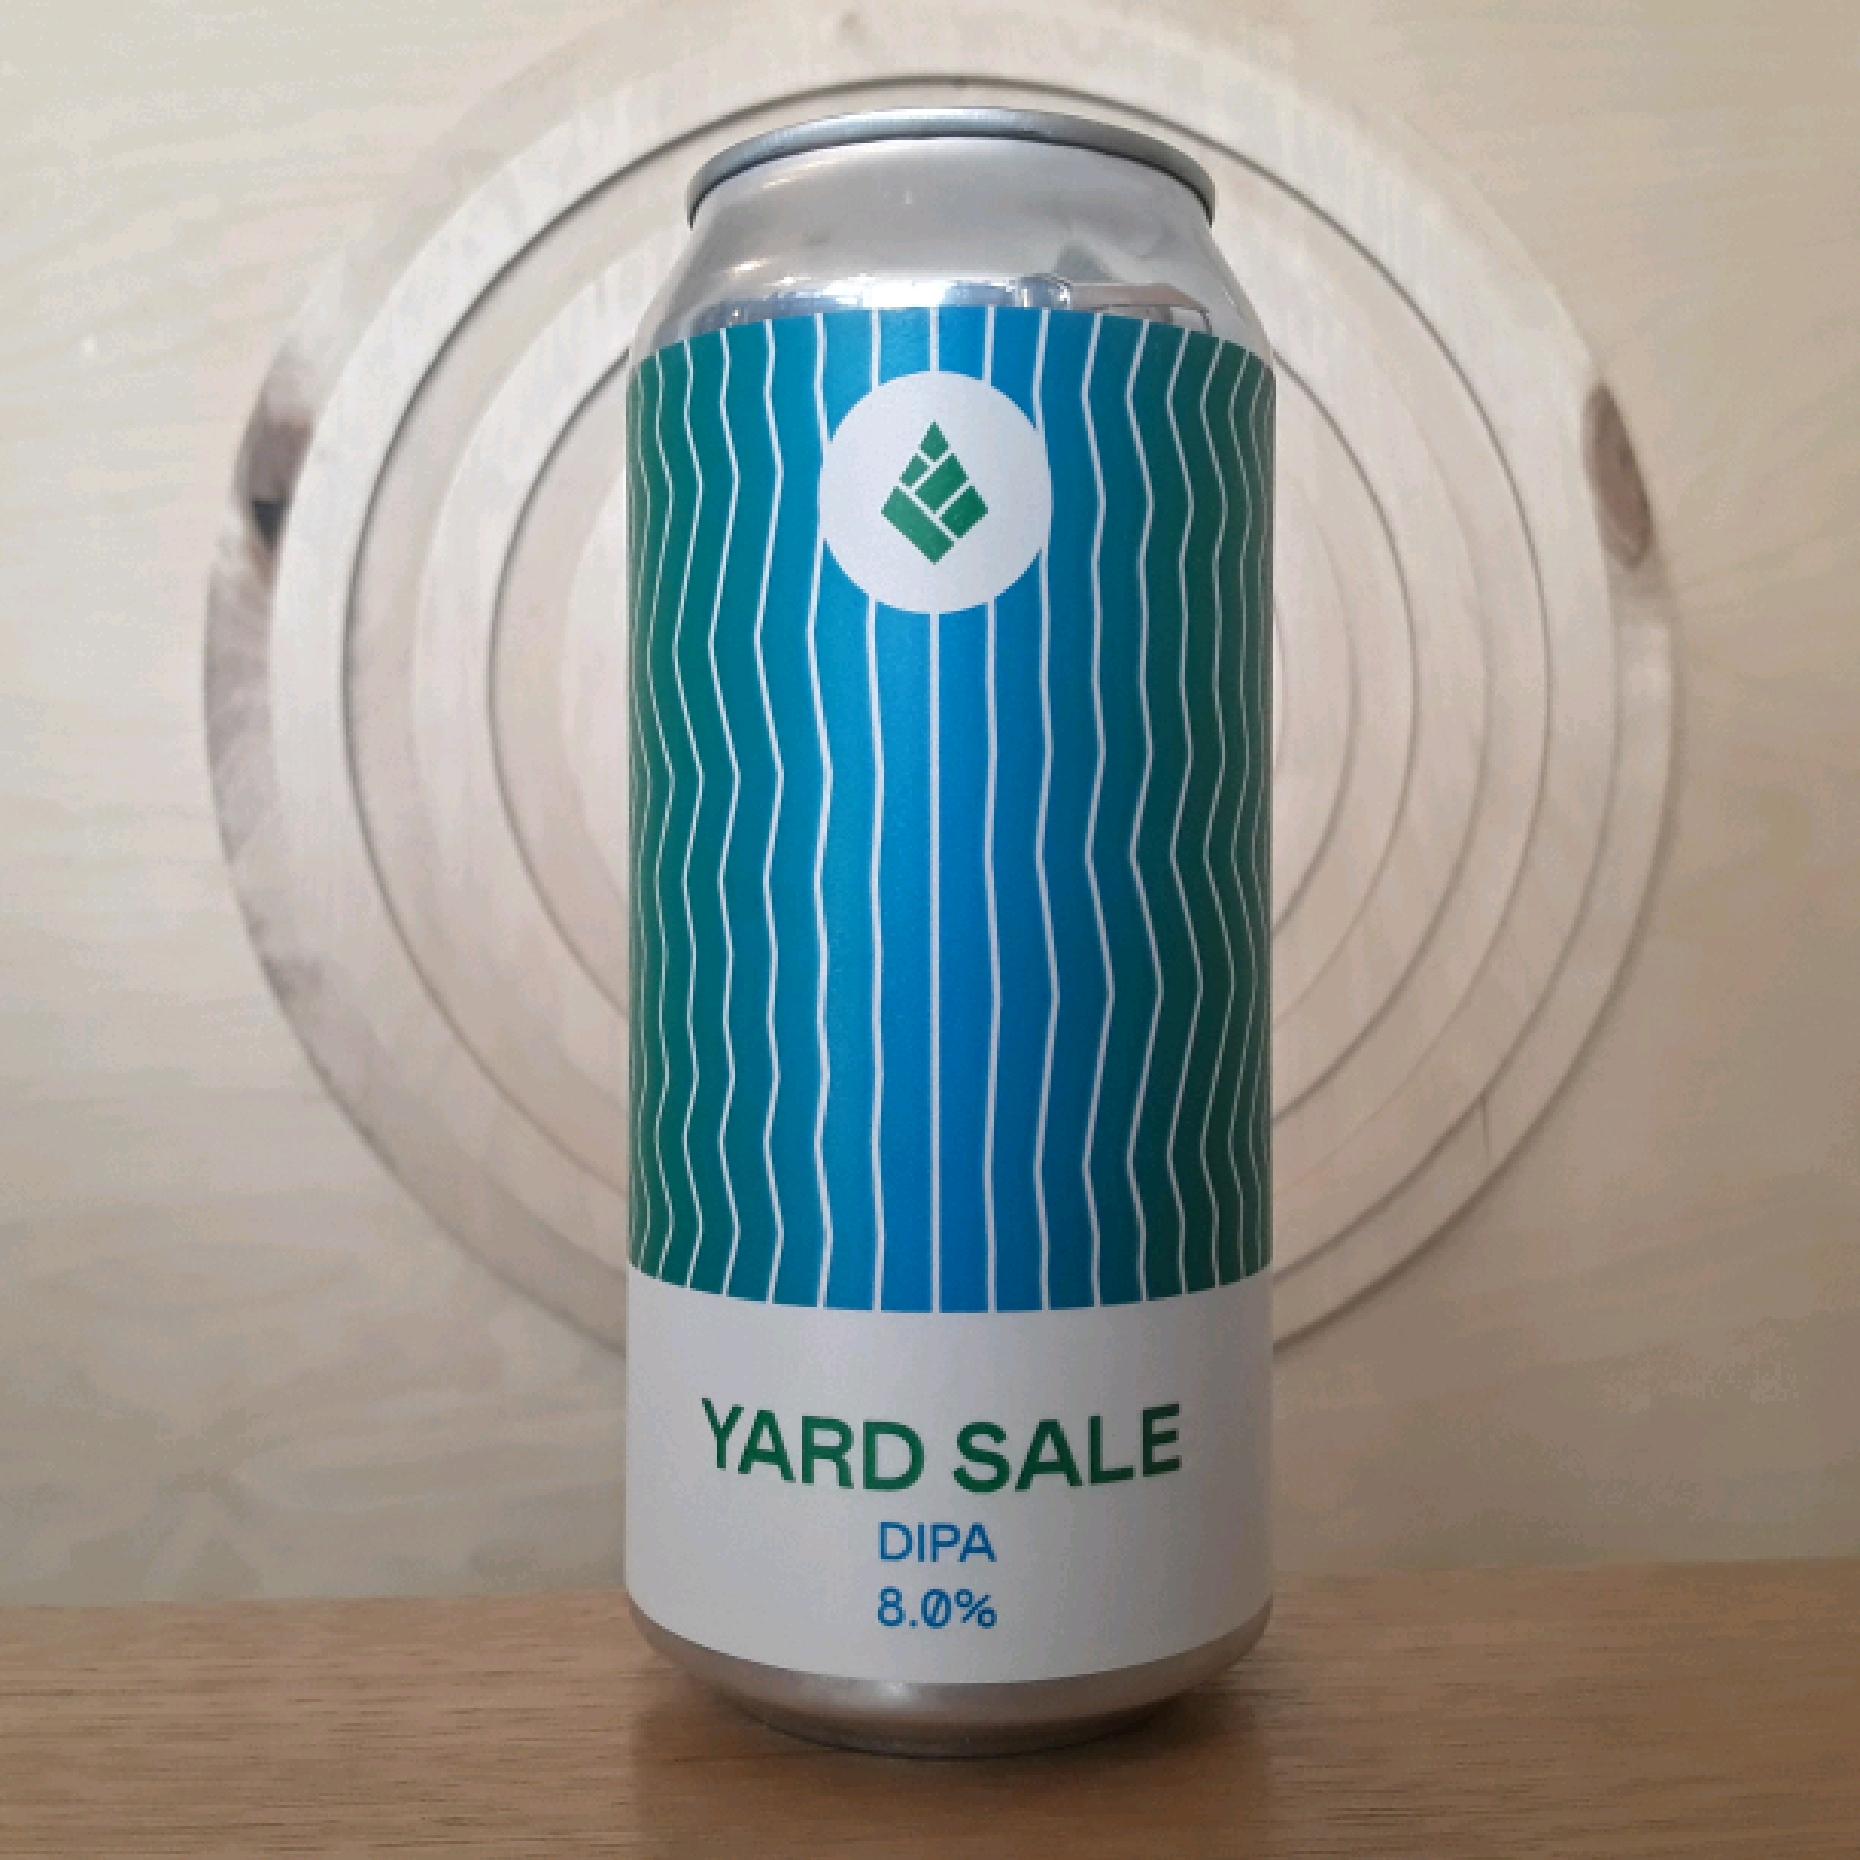 Drop Project Yard Sale DDH DIPA